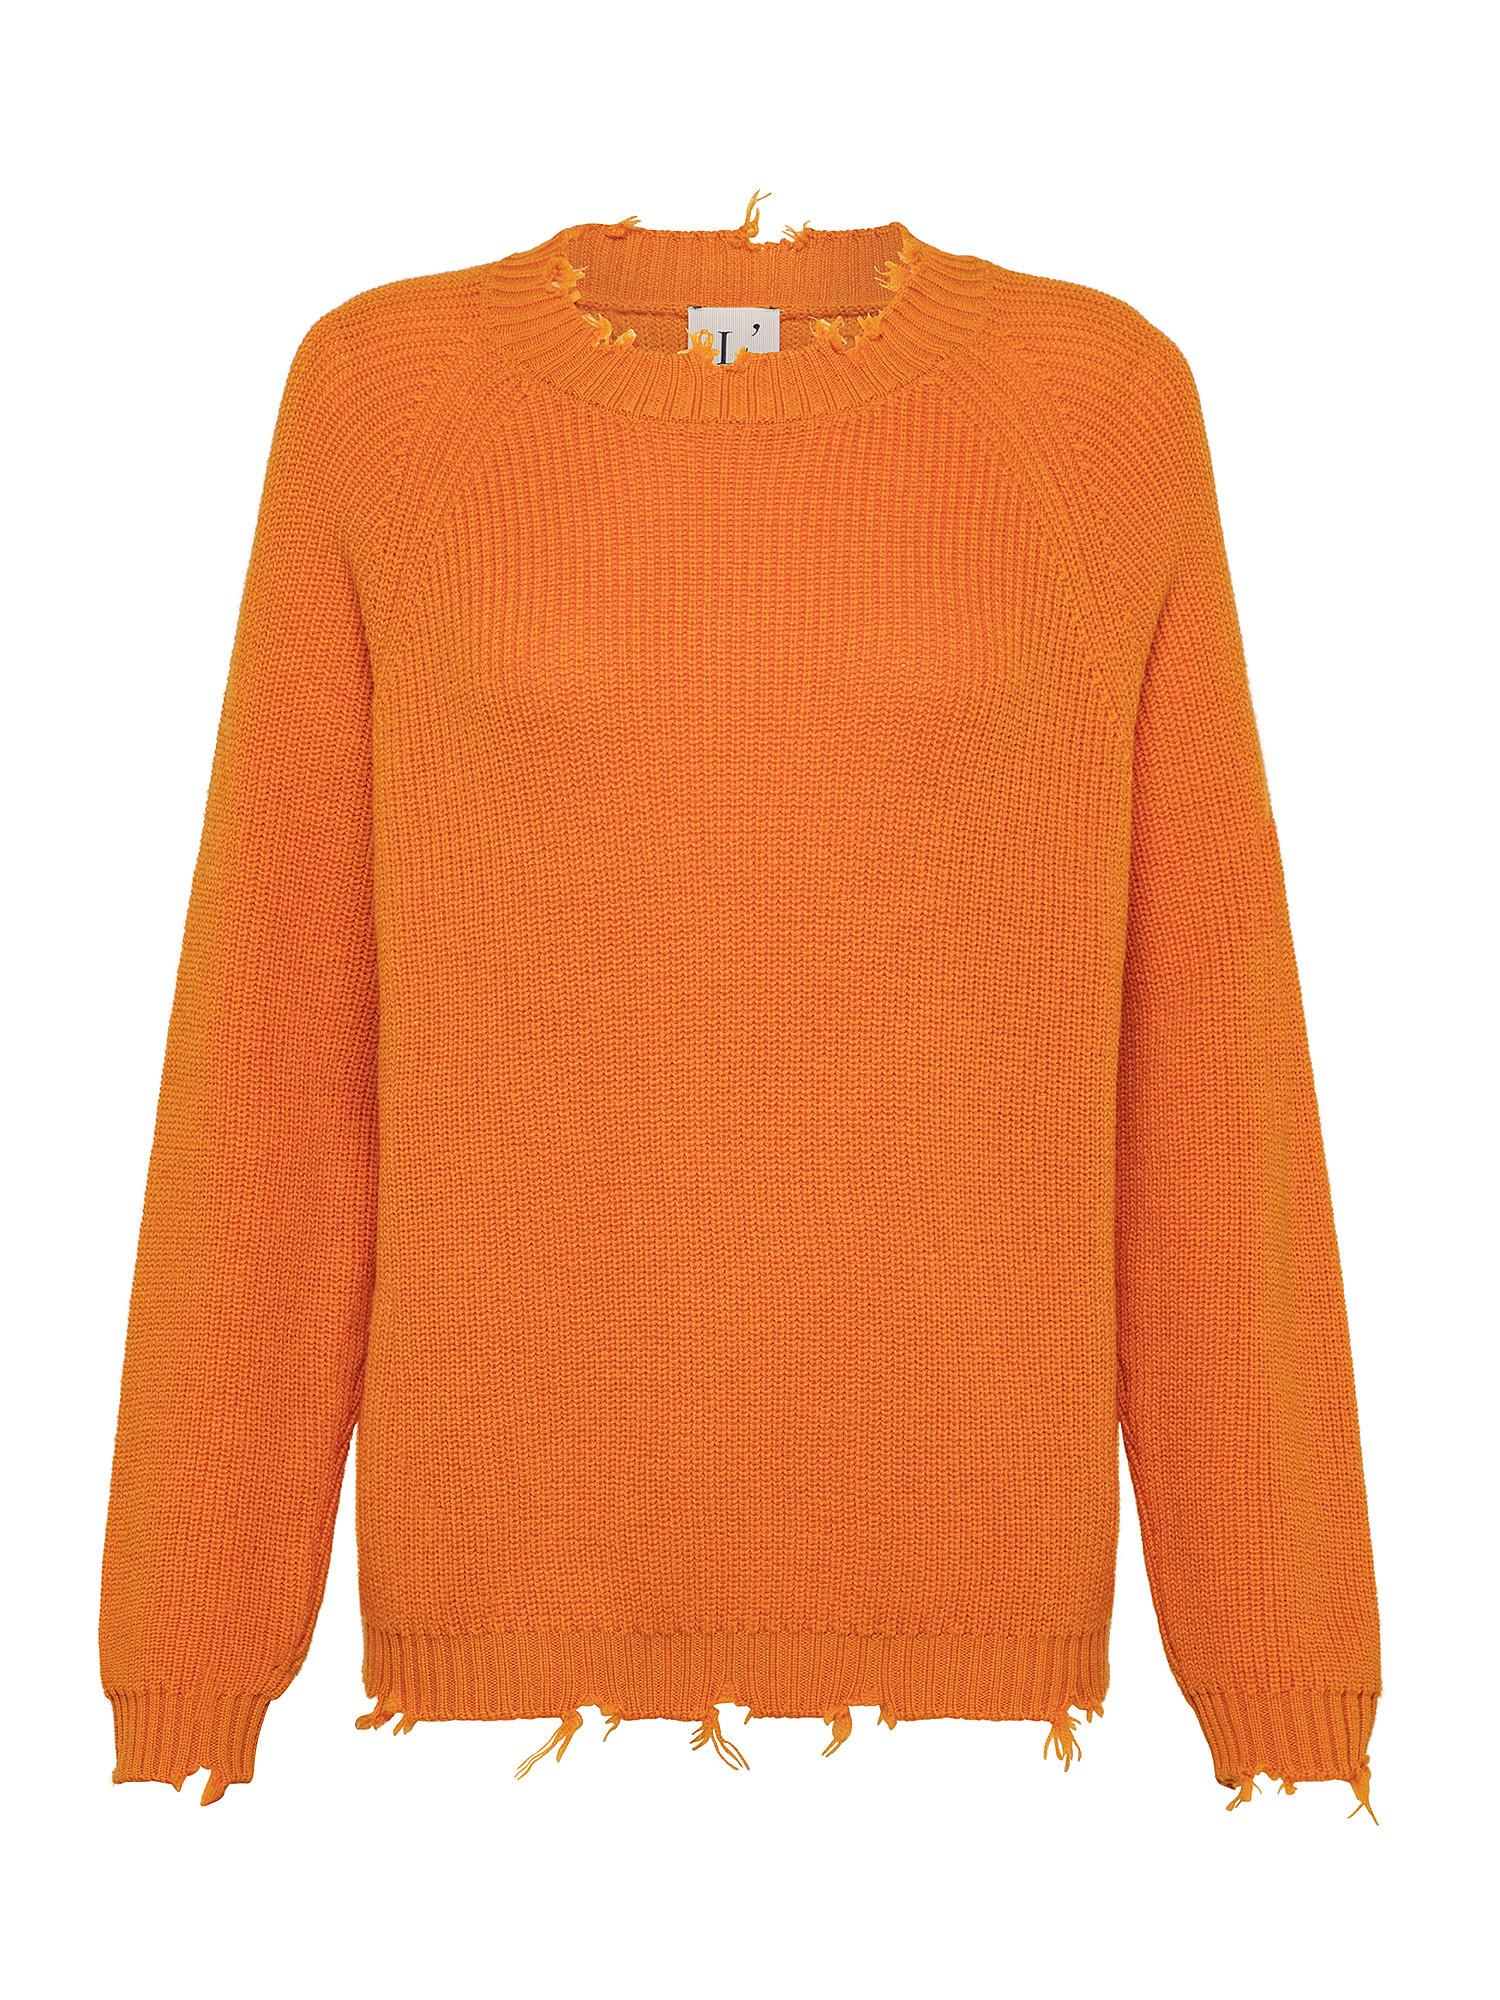 Maglione in pura lana, Arancione, large image number 0